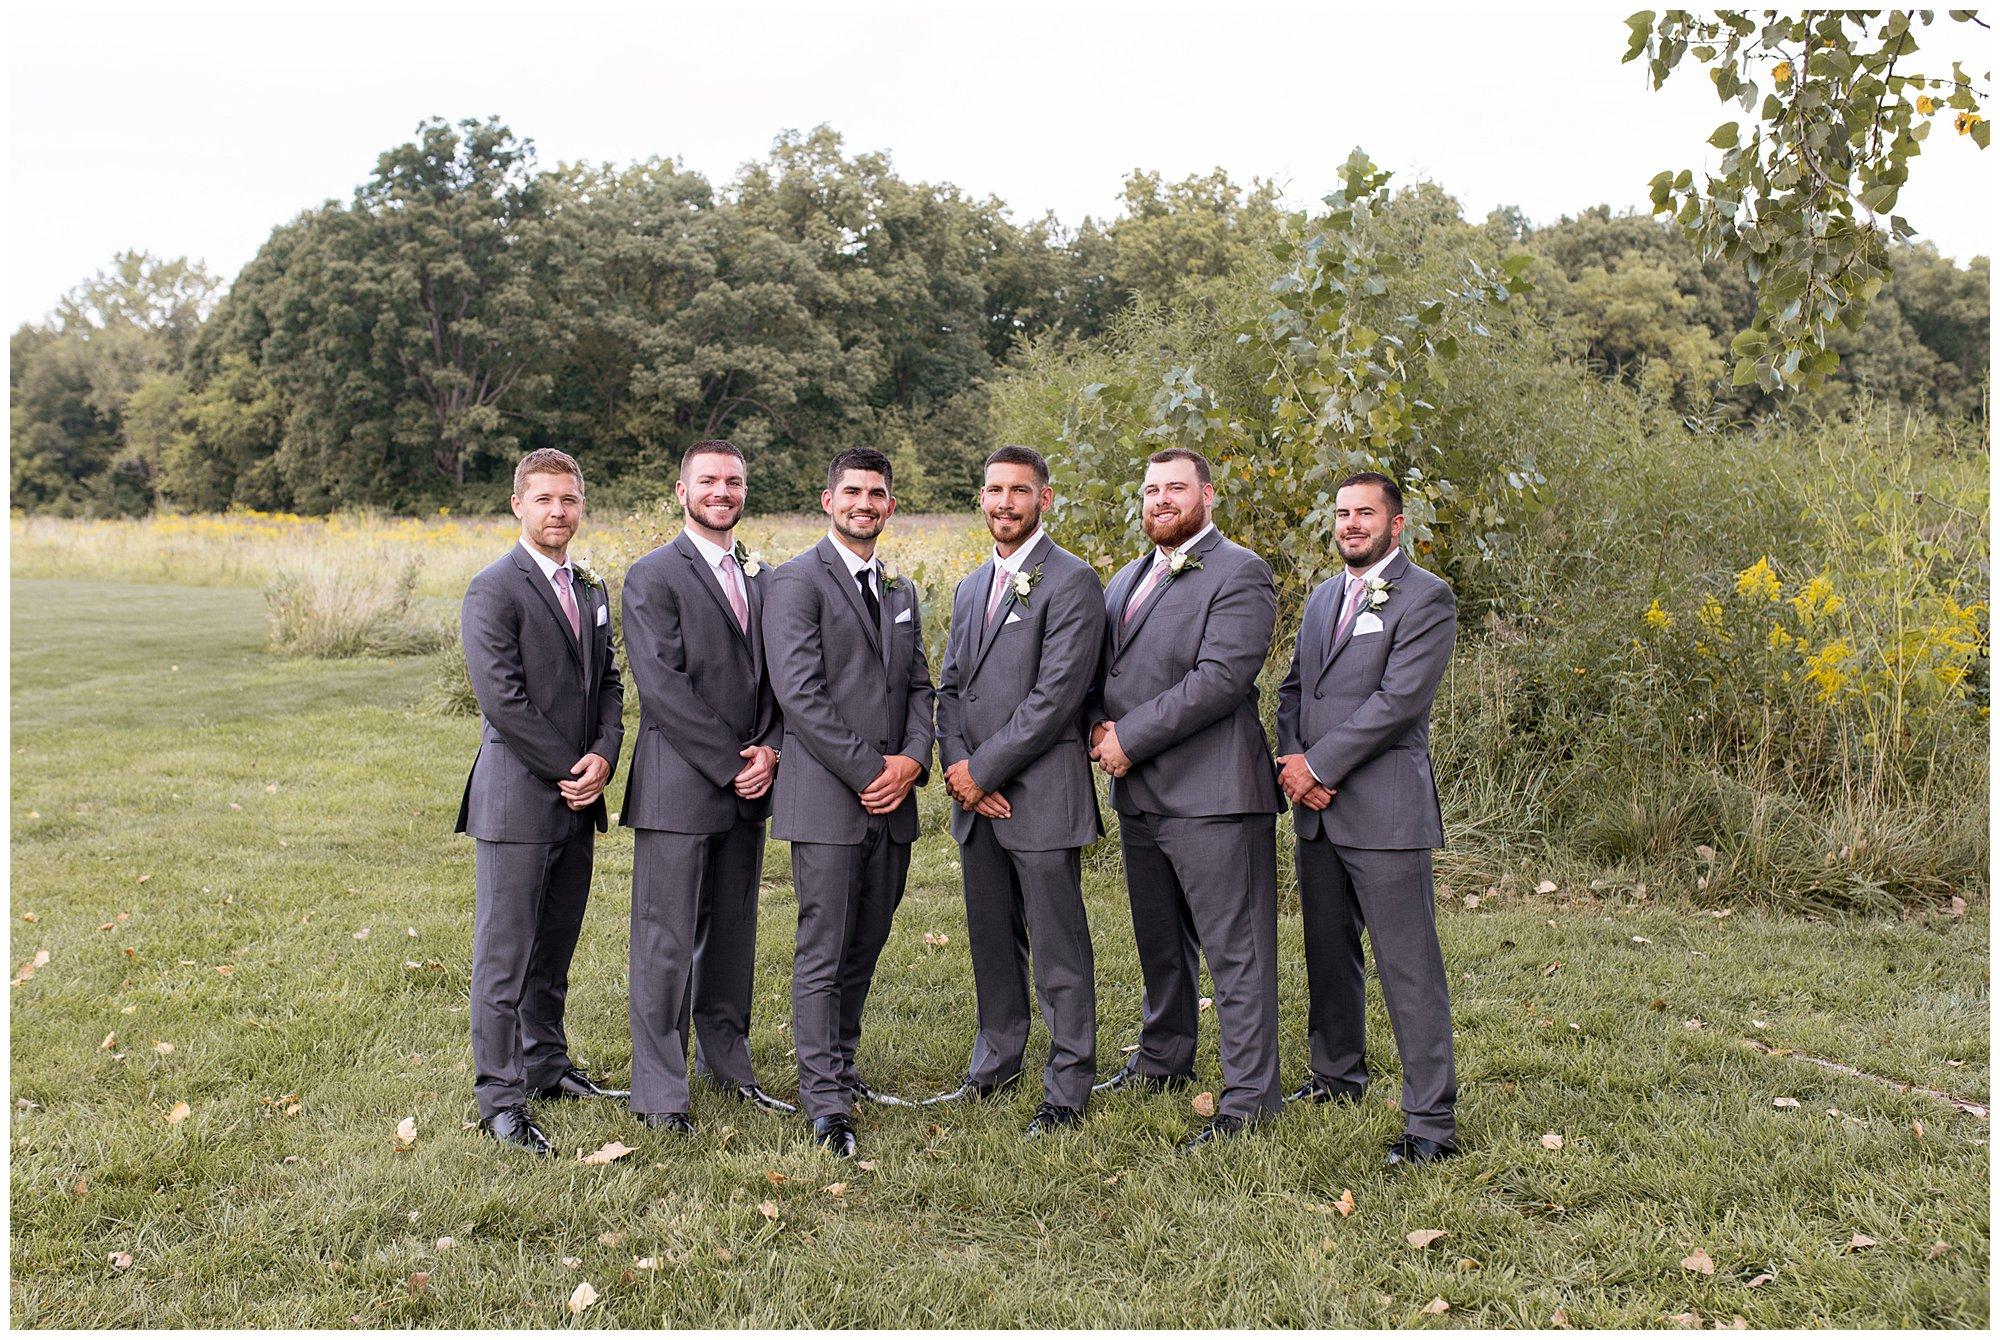 groom and groomsmen portraits before Fort Wayne wedding at Union 12